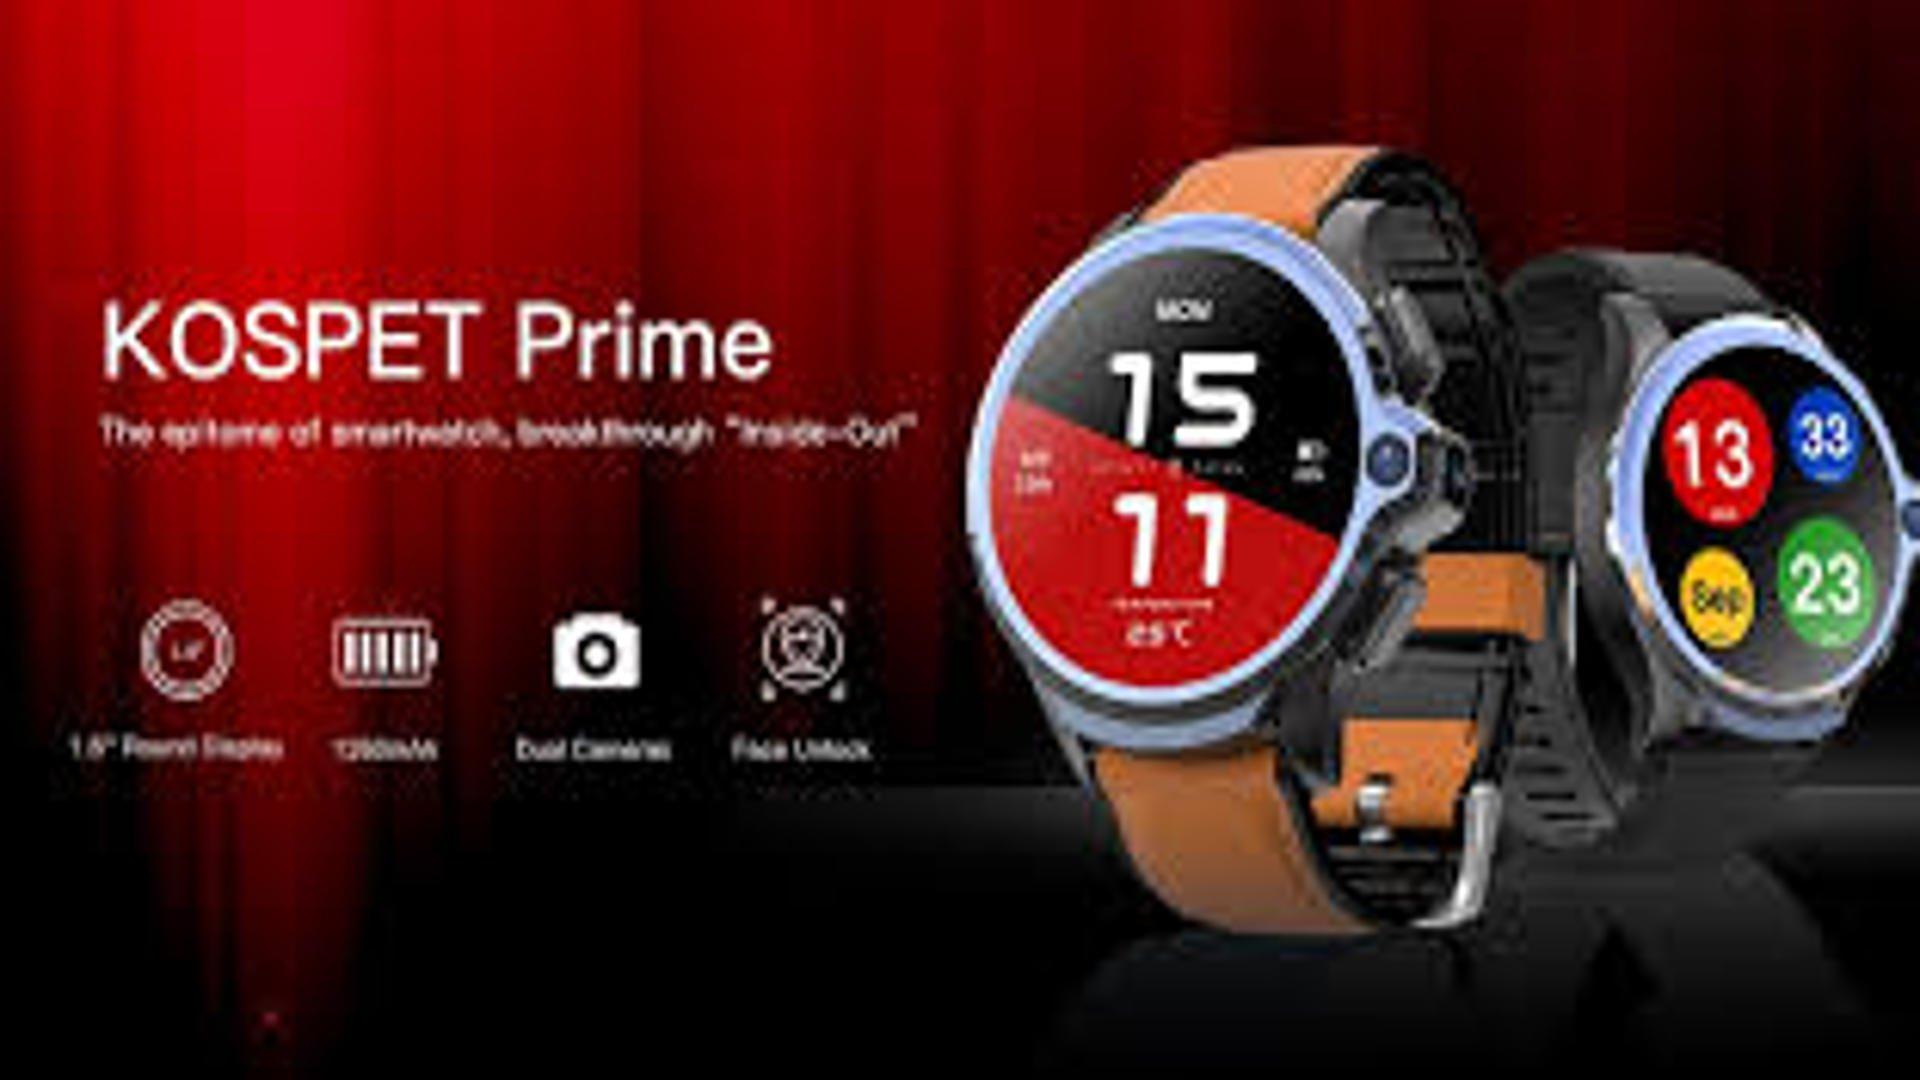 Kospet Prime –  Gearbest